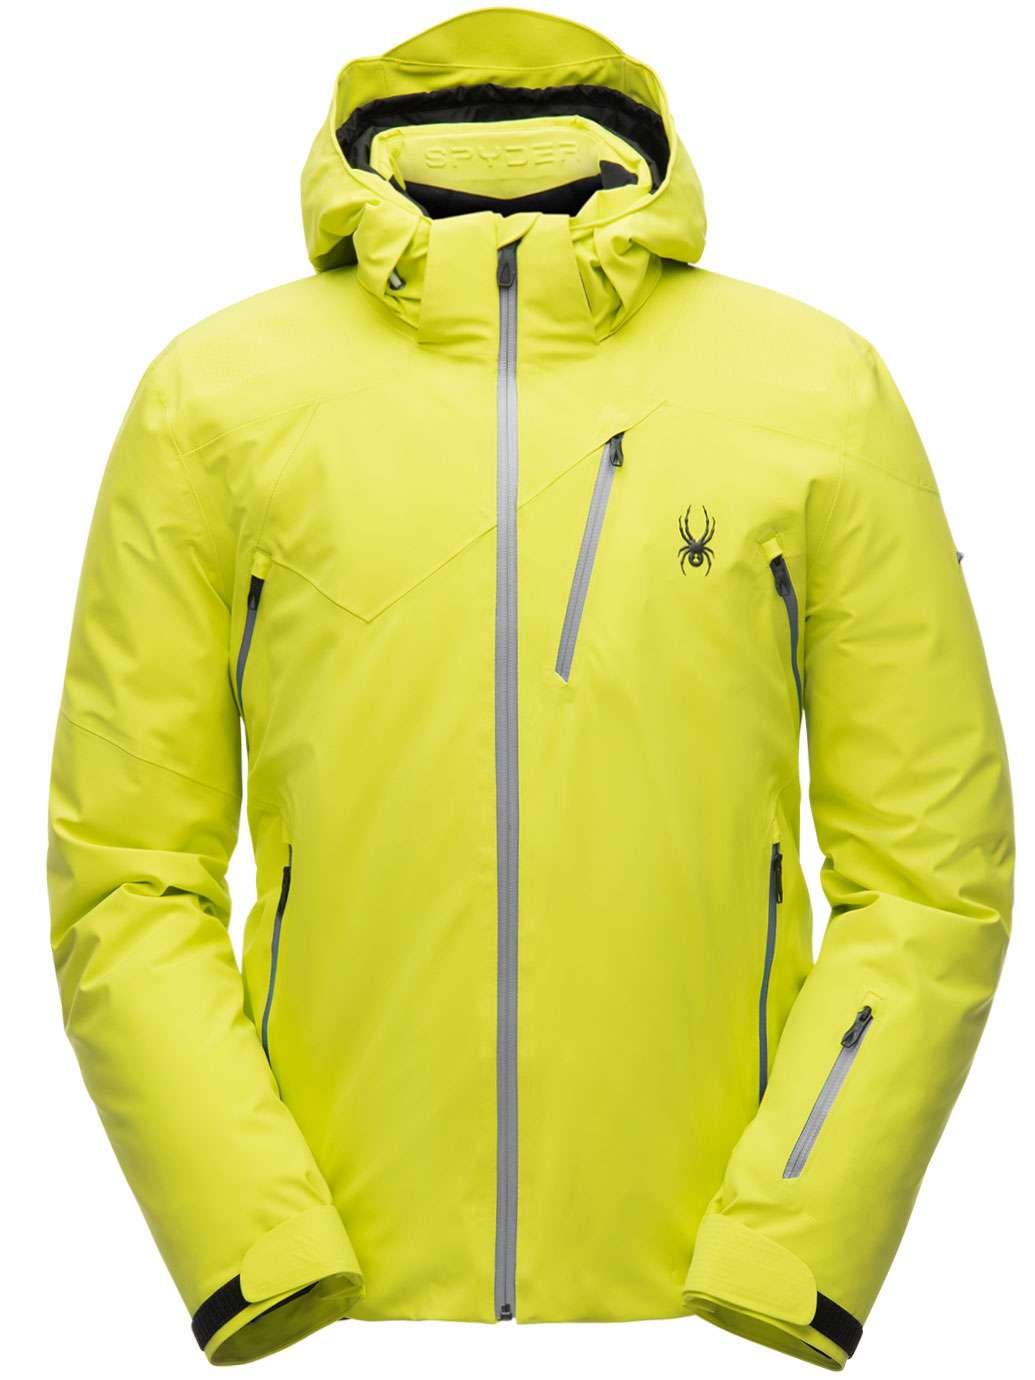 767a5198508f Spyder Cordin - Ski Jackets - buy online at Sport Gardena